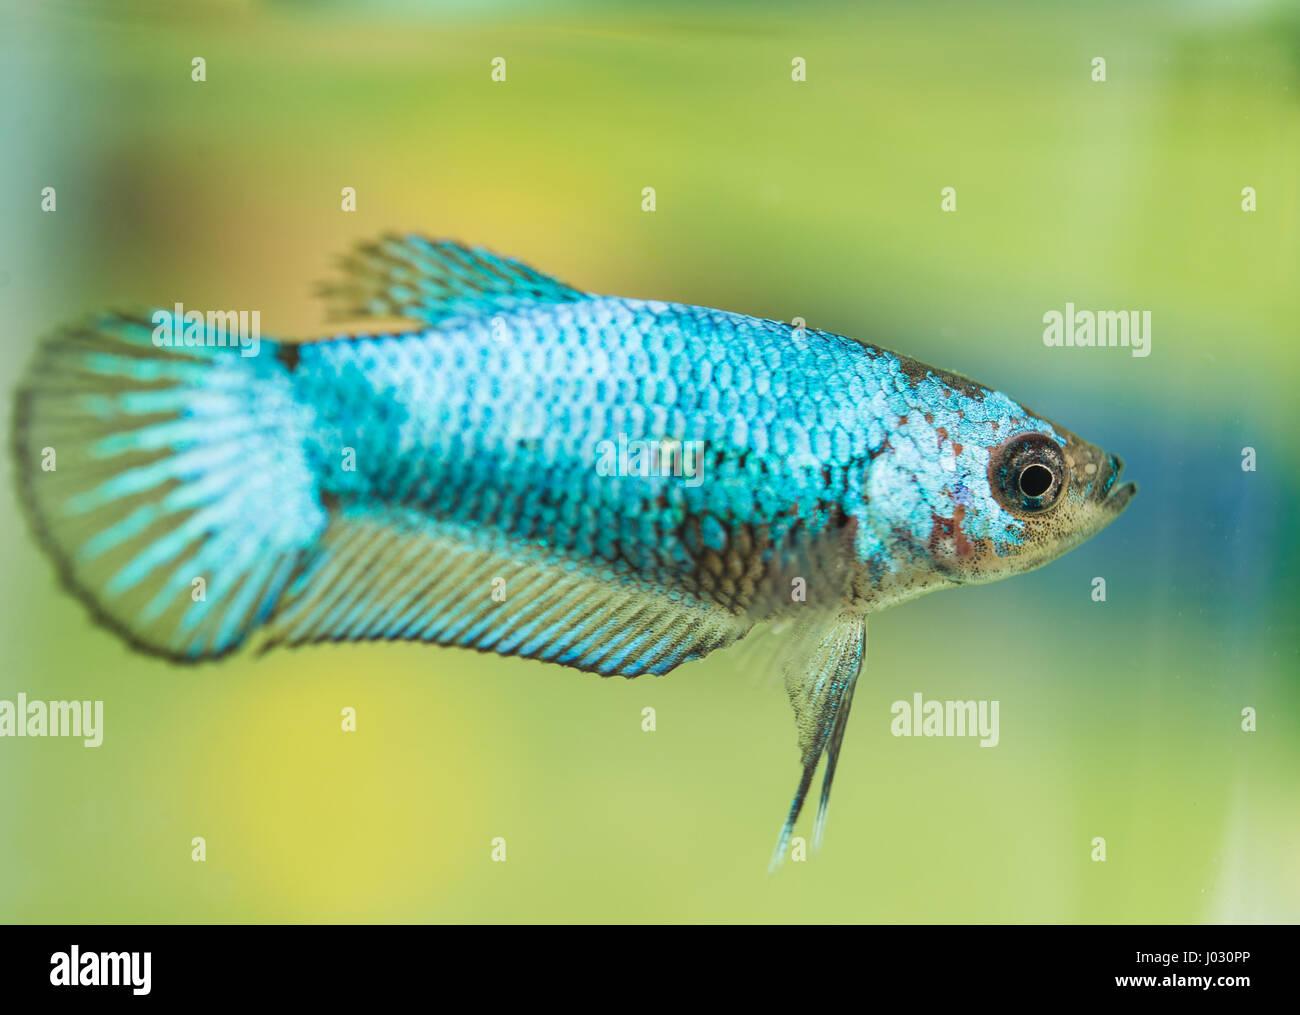 Young Betta Splendens Female Fish Stock Photo: 137749438 - Alamy